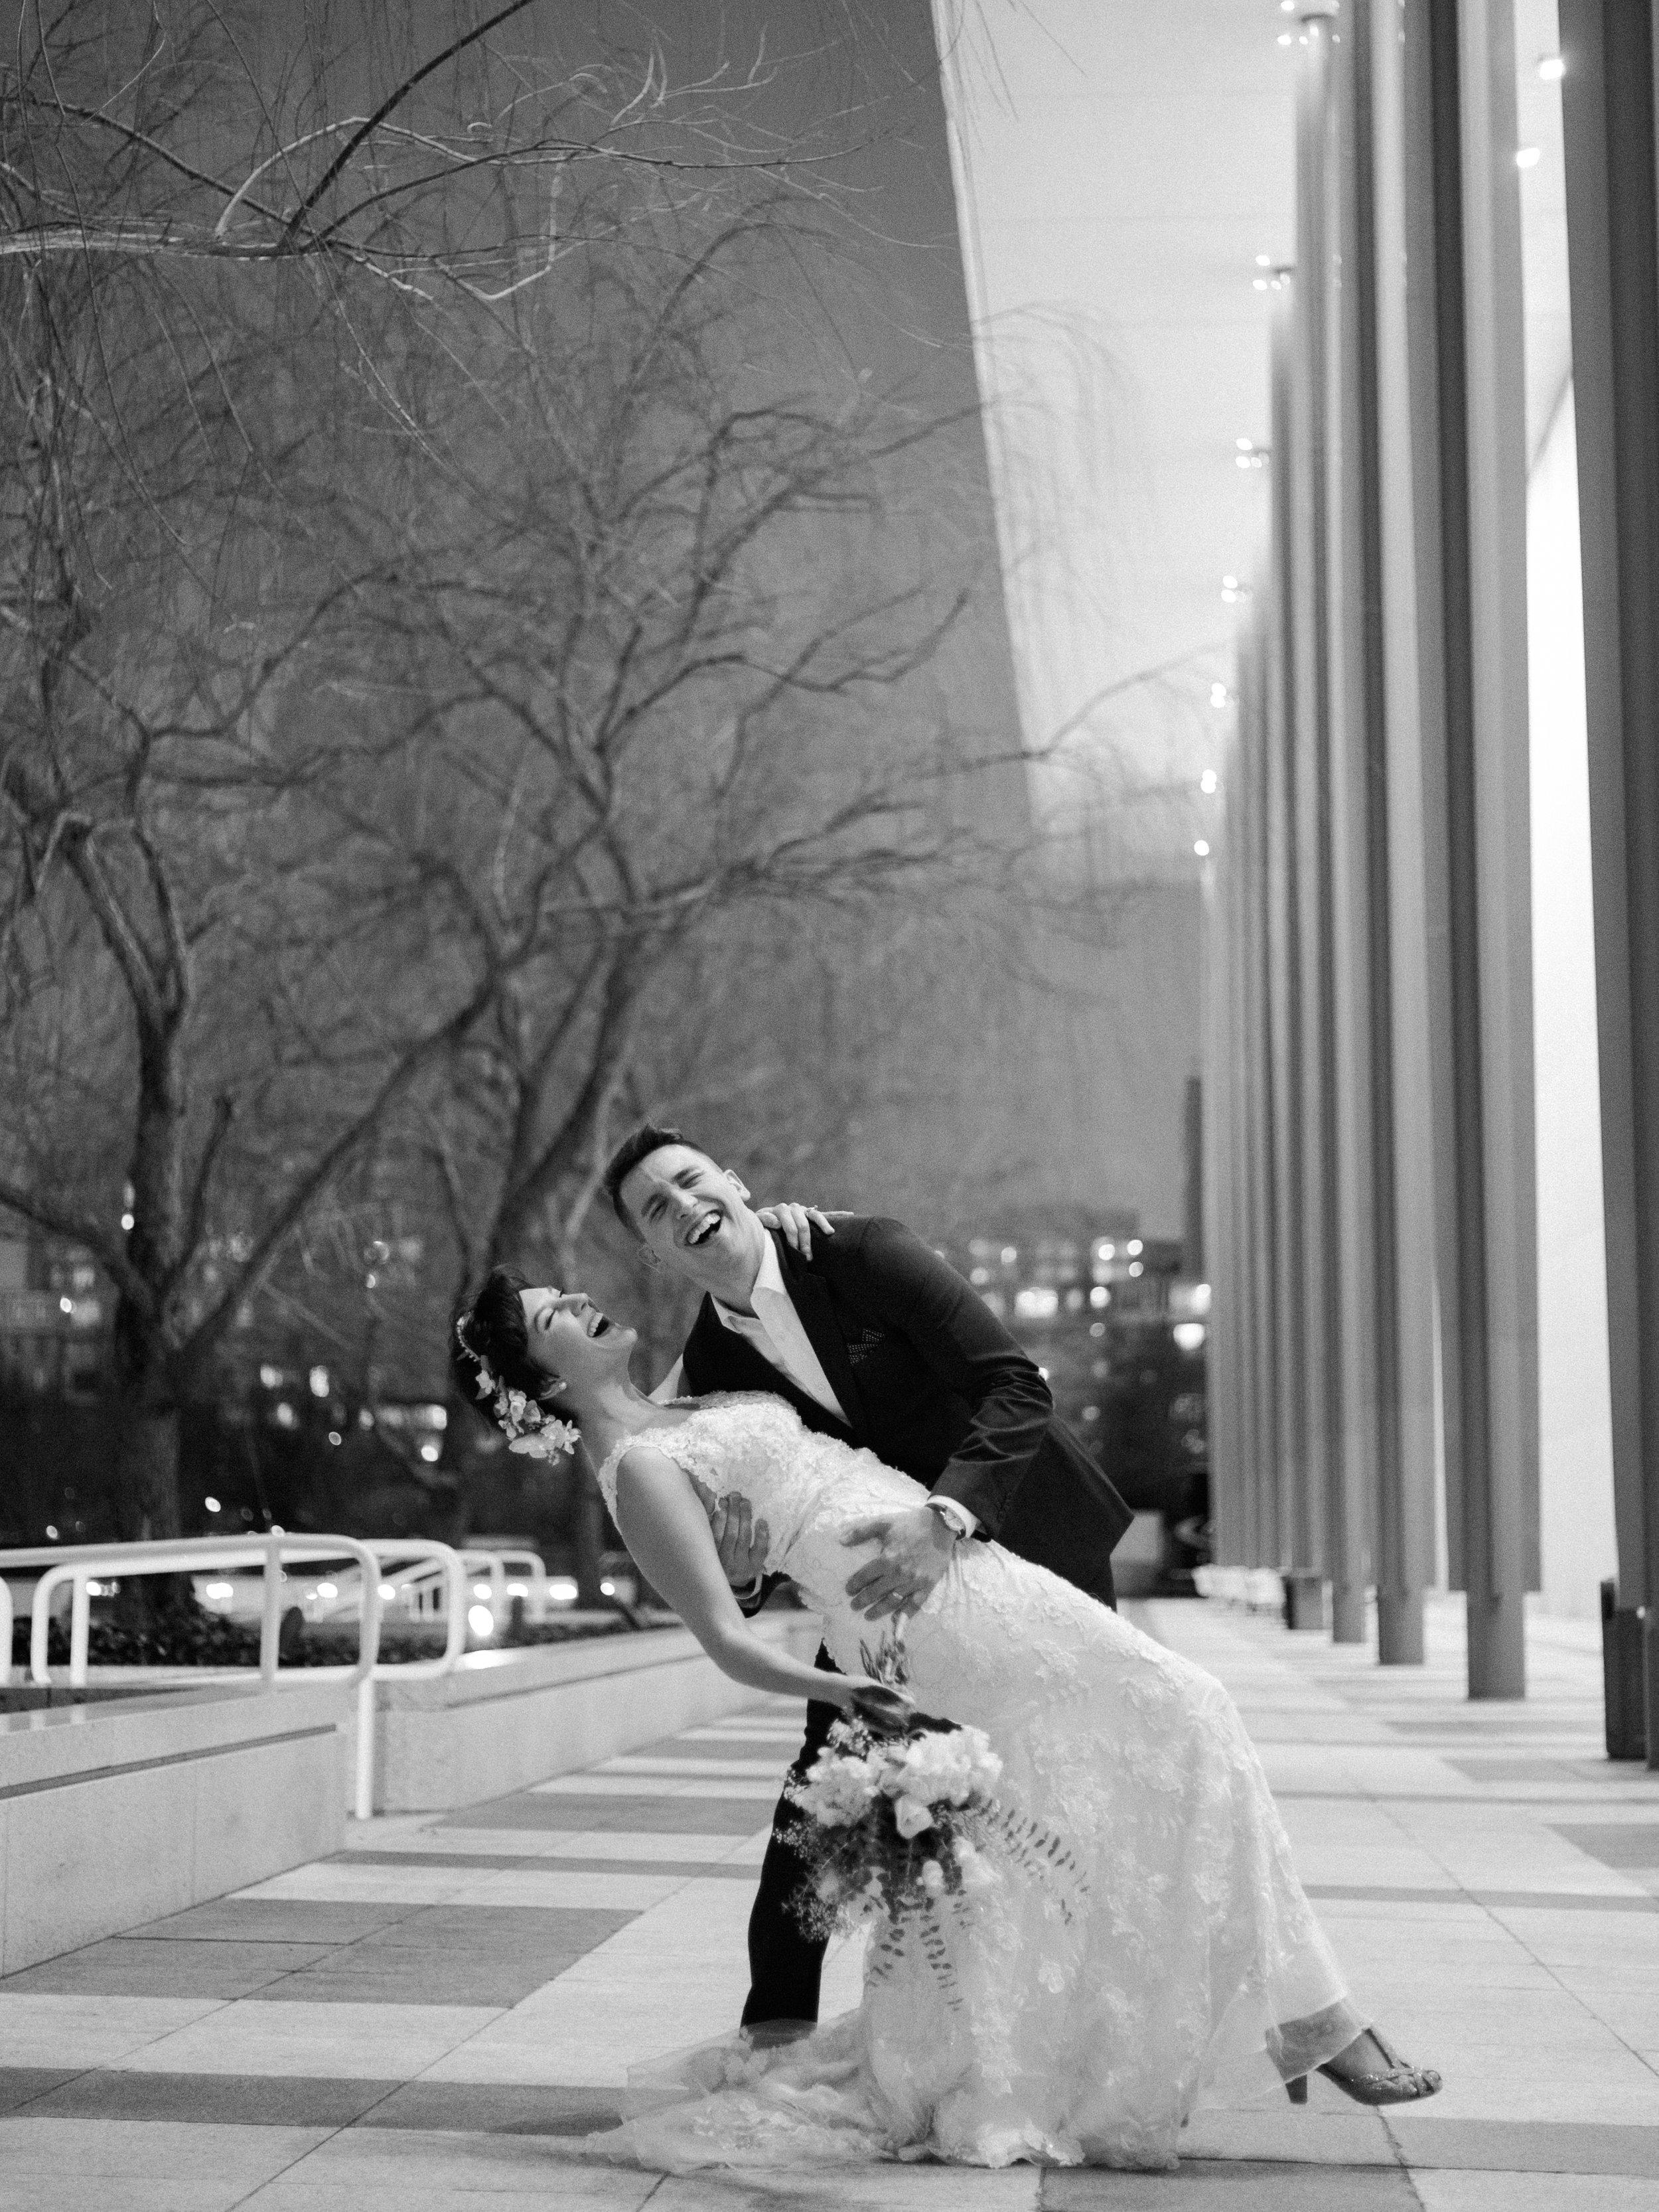 Wedding+Photos+at+the+Kennedy+Center+in+Washington+DC+by+Destination+Wedding+Photographer+Matt+Erickson+Photography.jpg